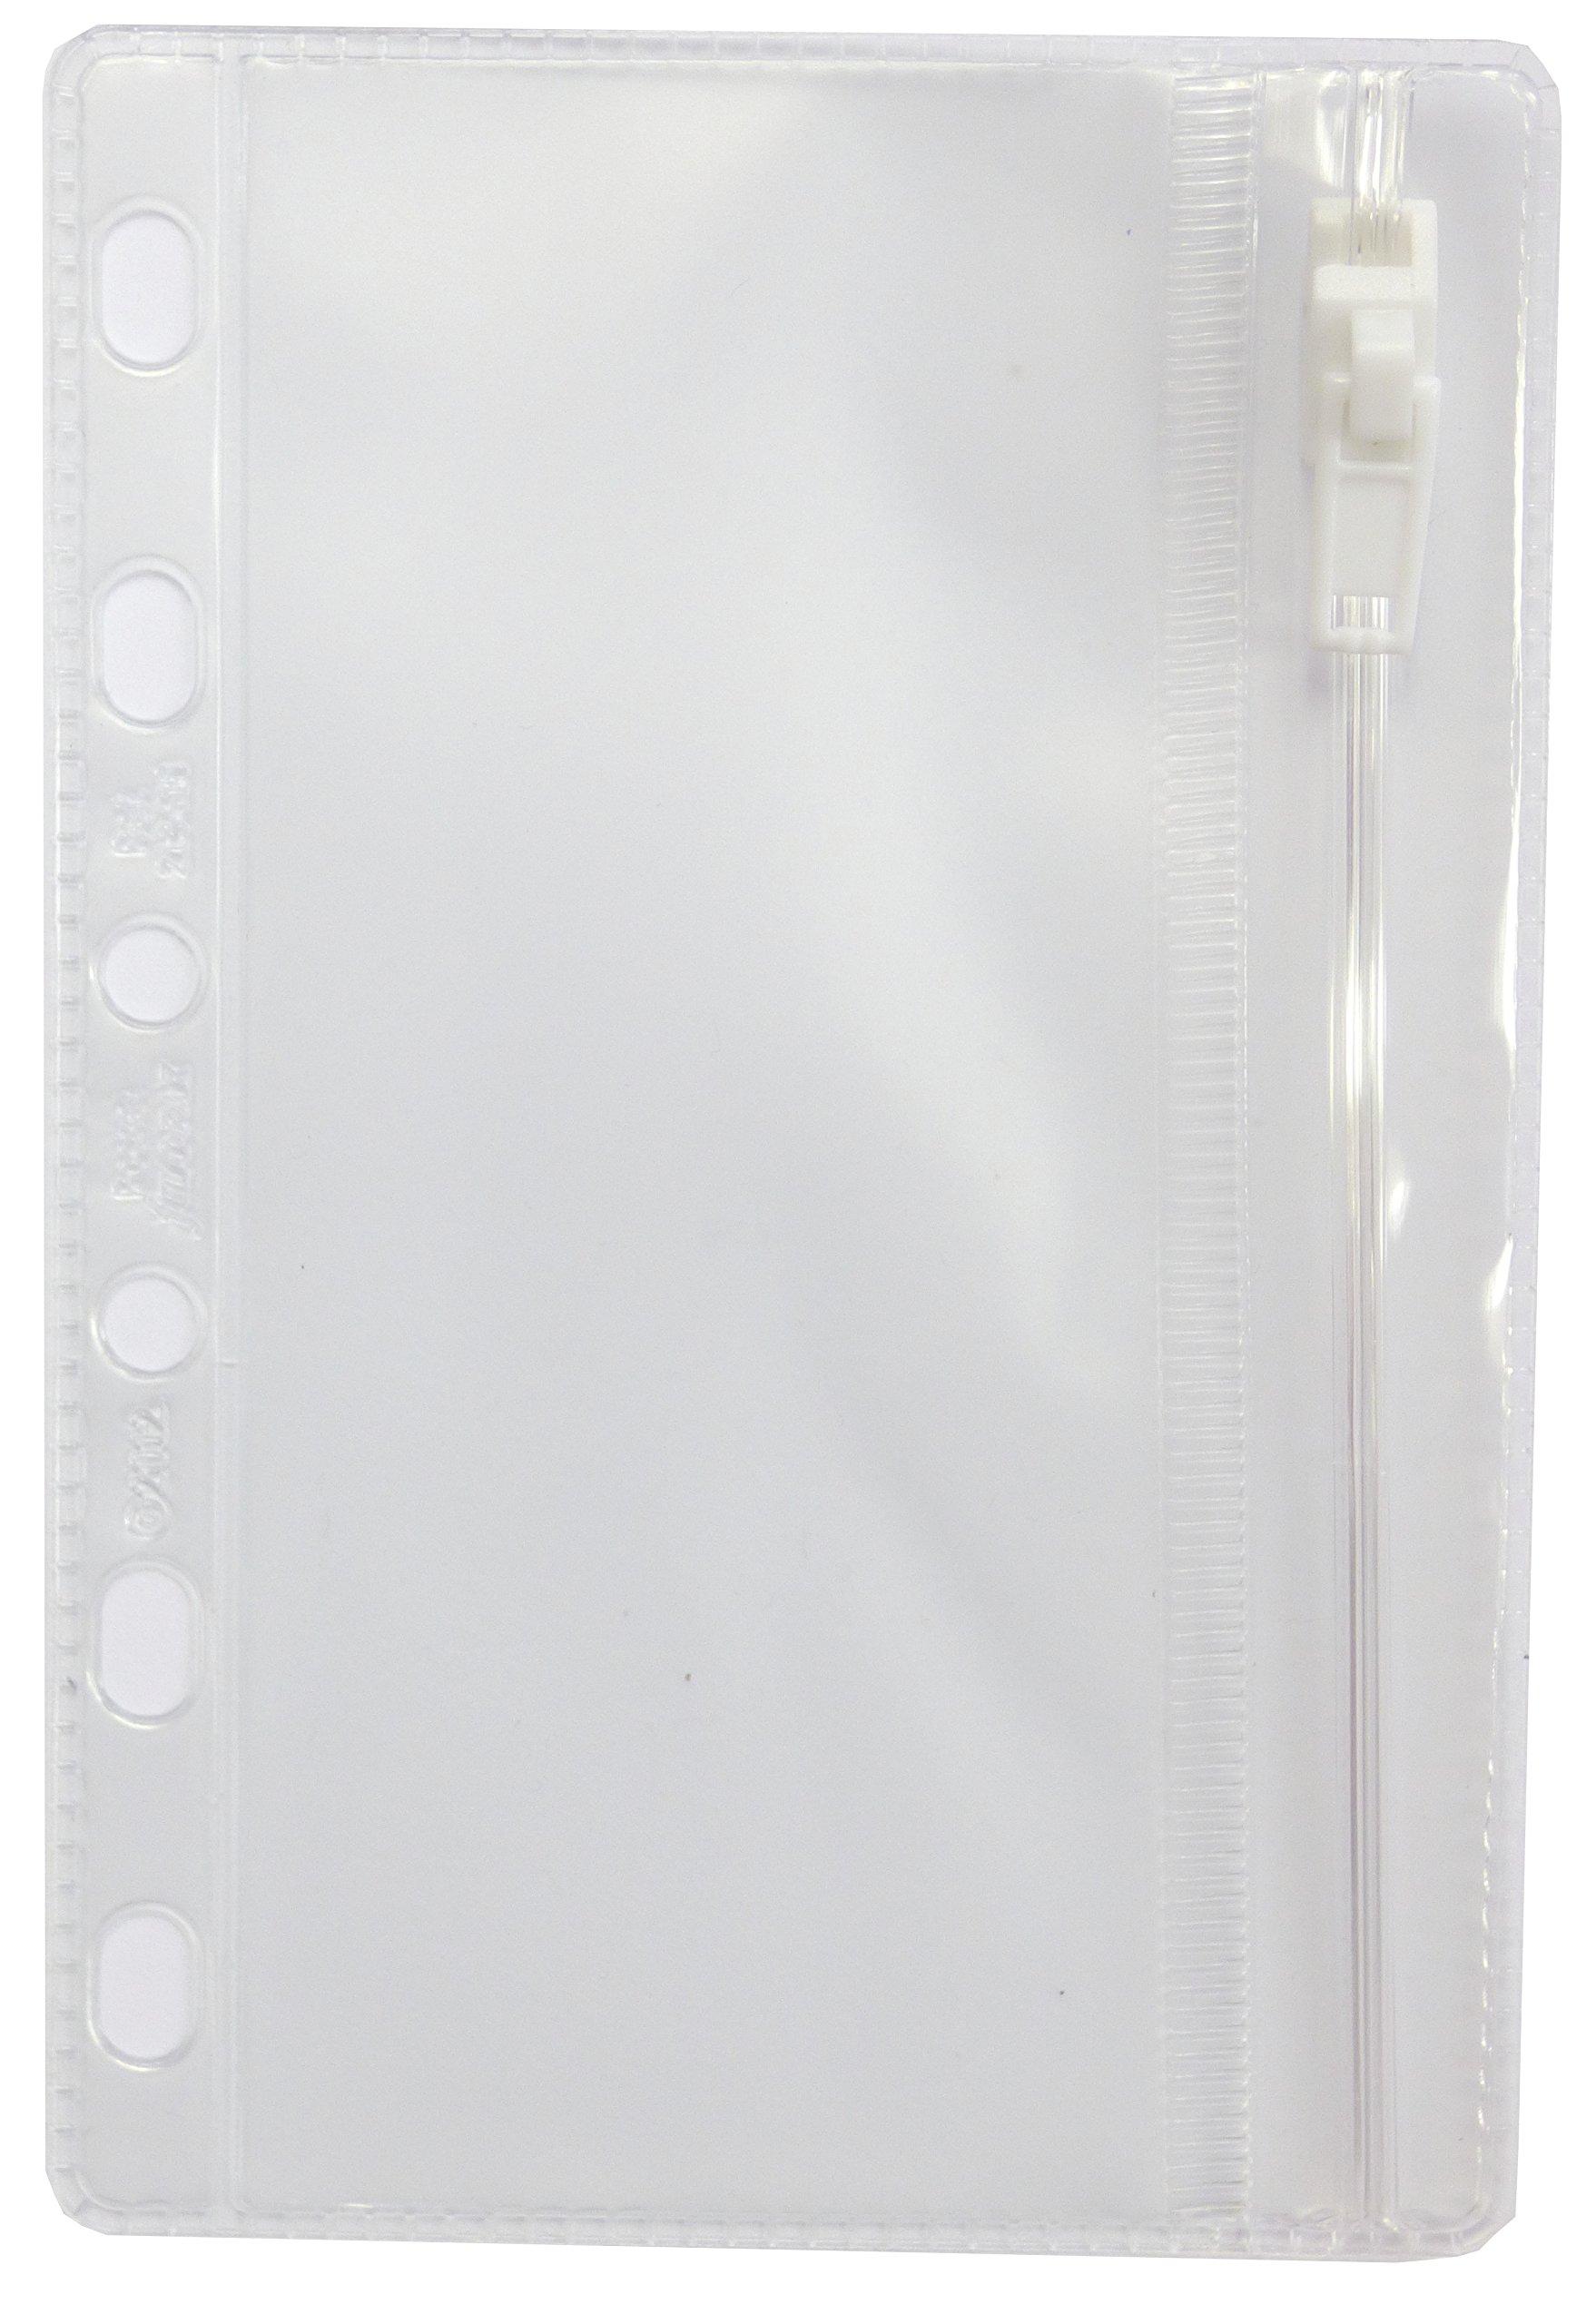 Filofax Pocket Zip Lock Envelope